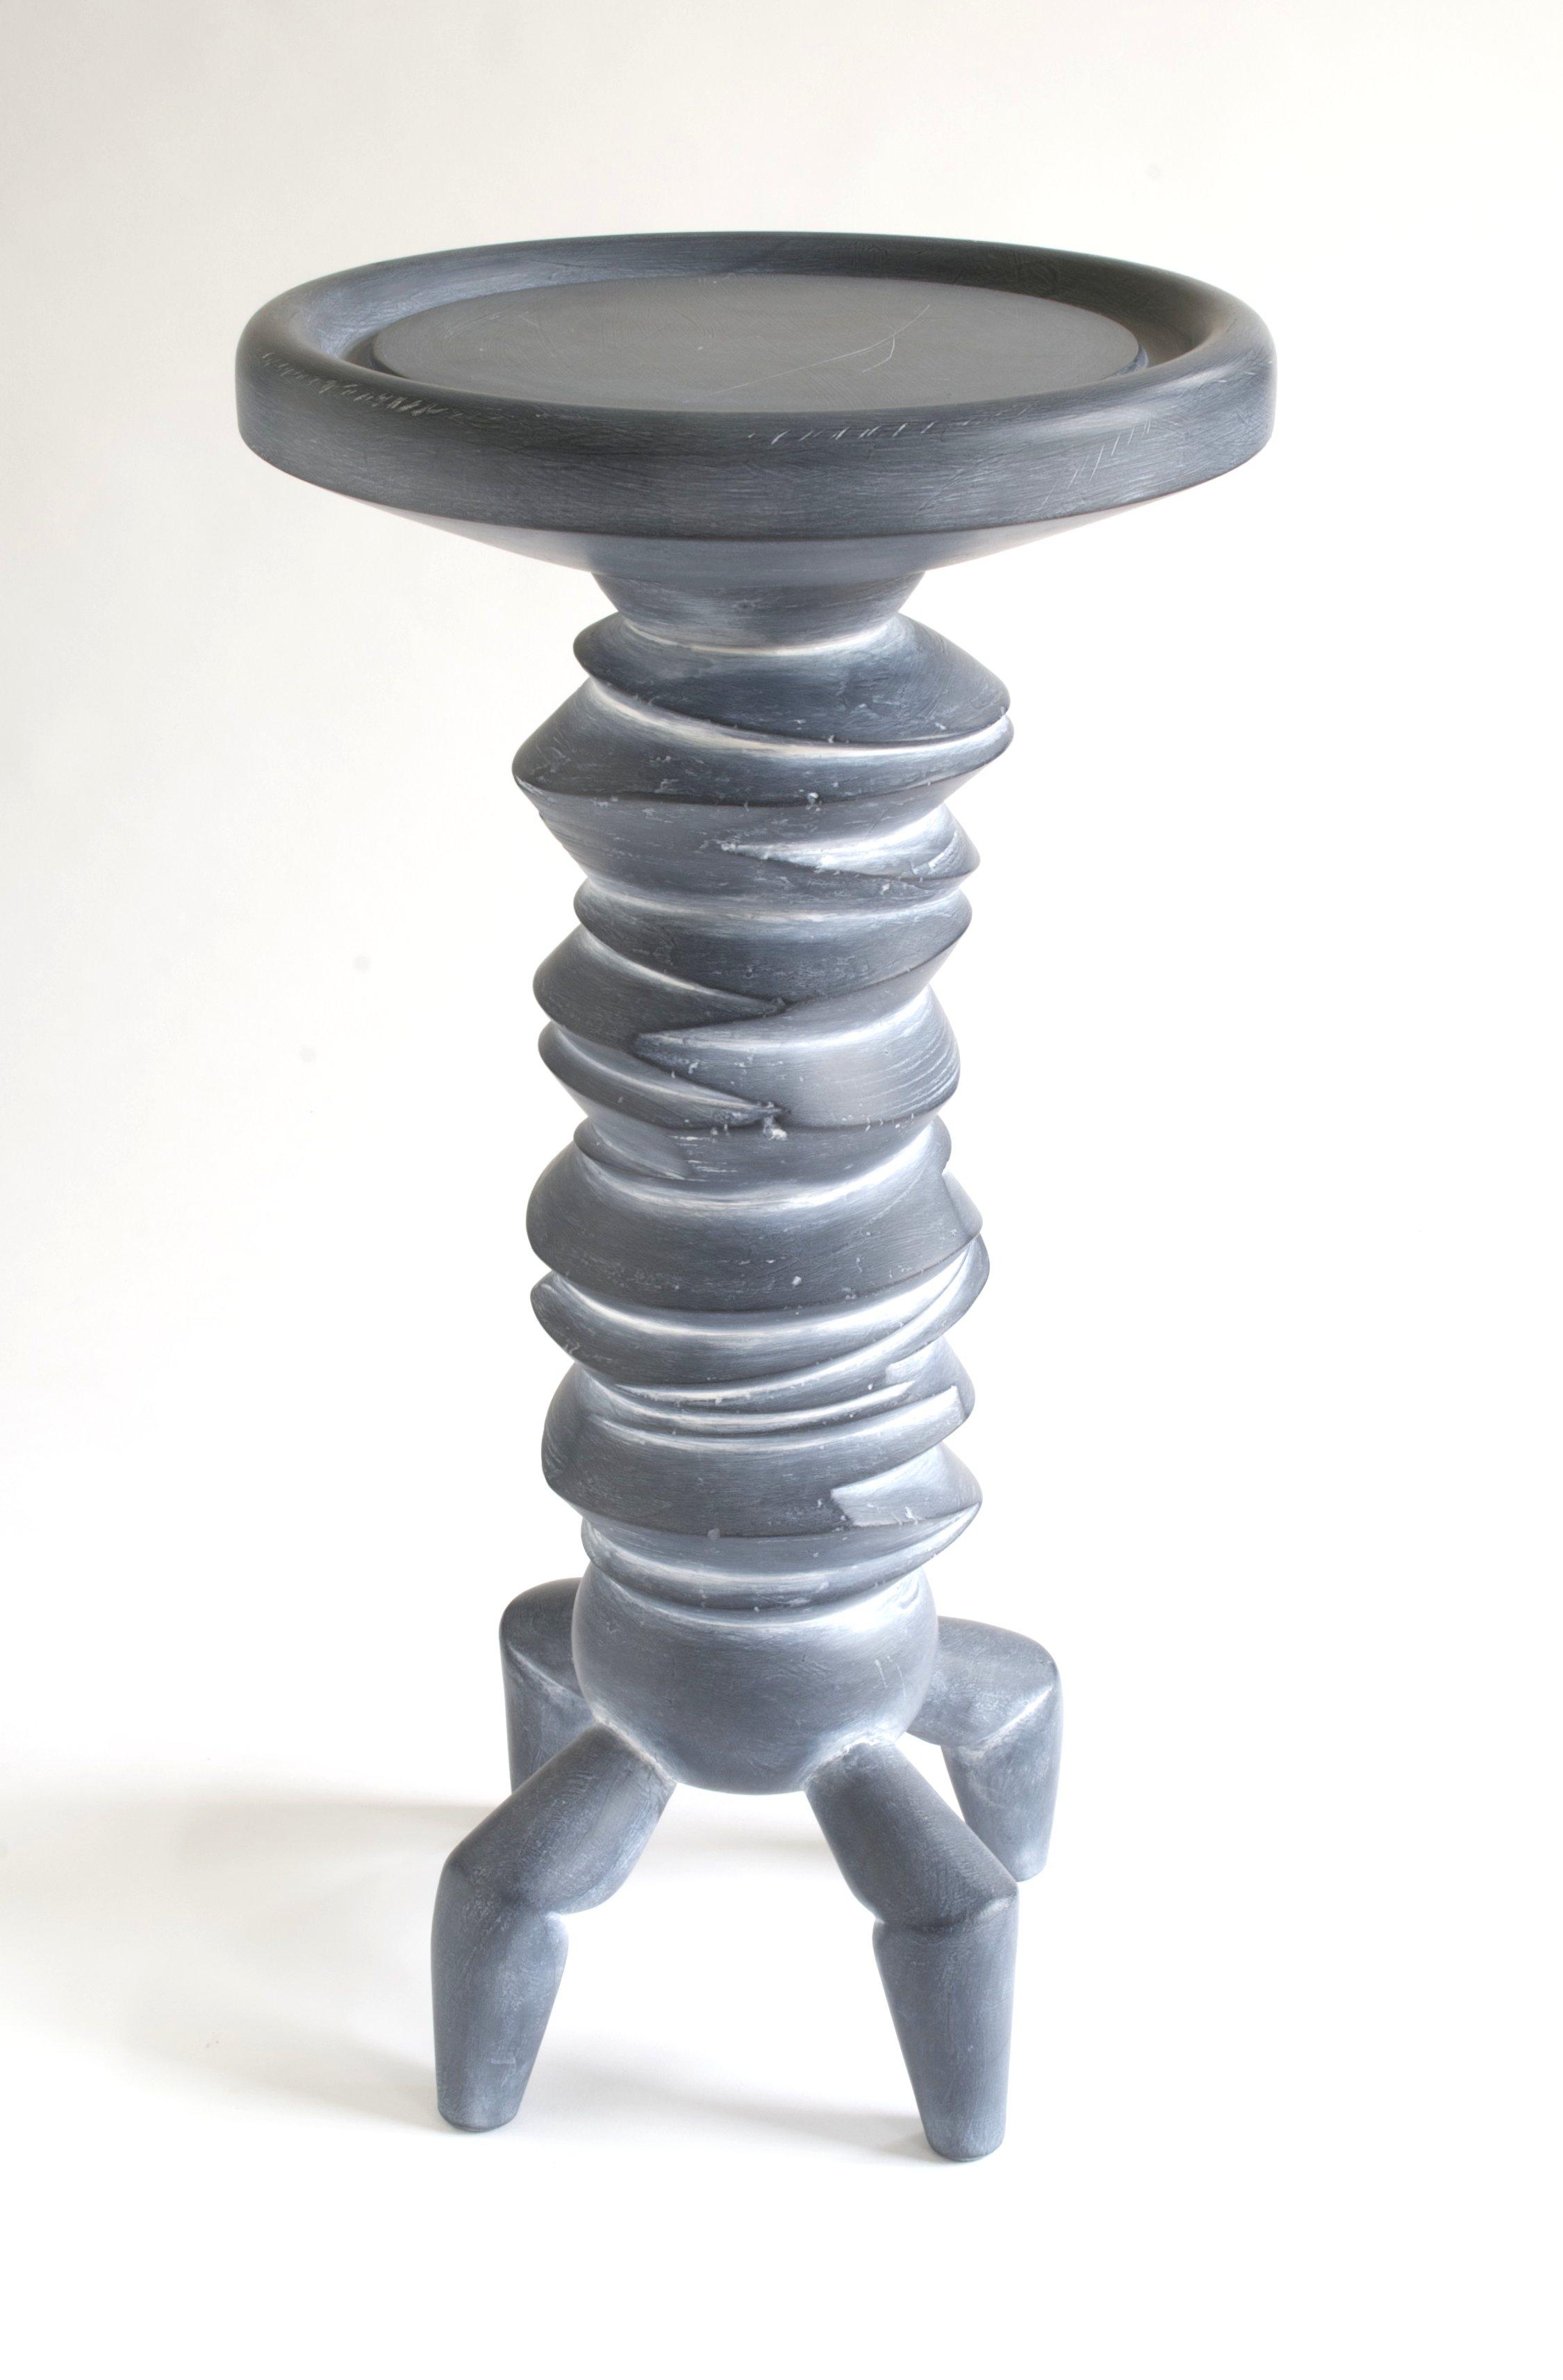 Pedestal Table, 2006